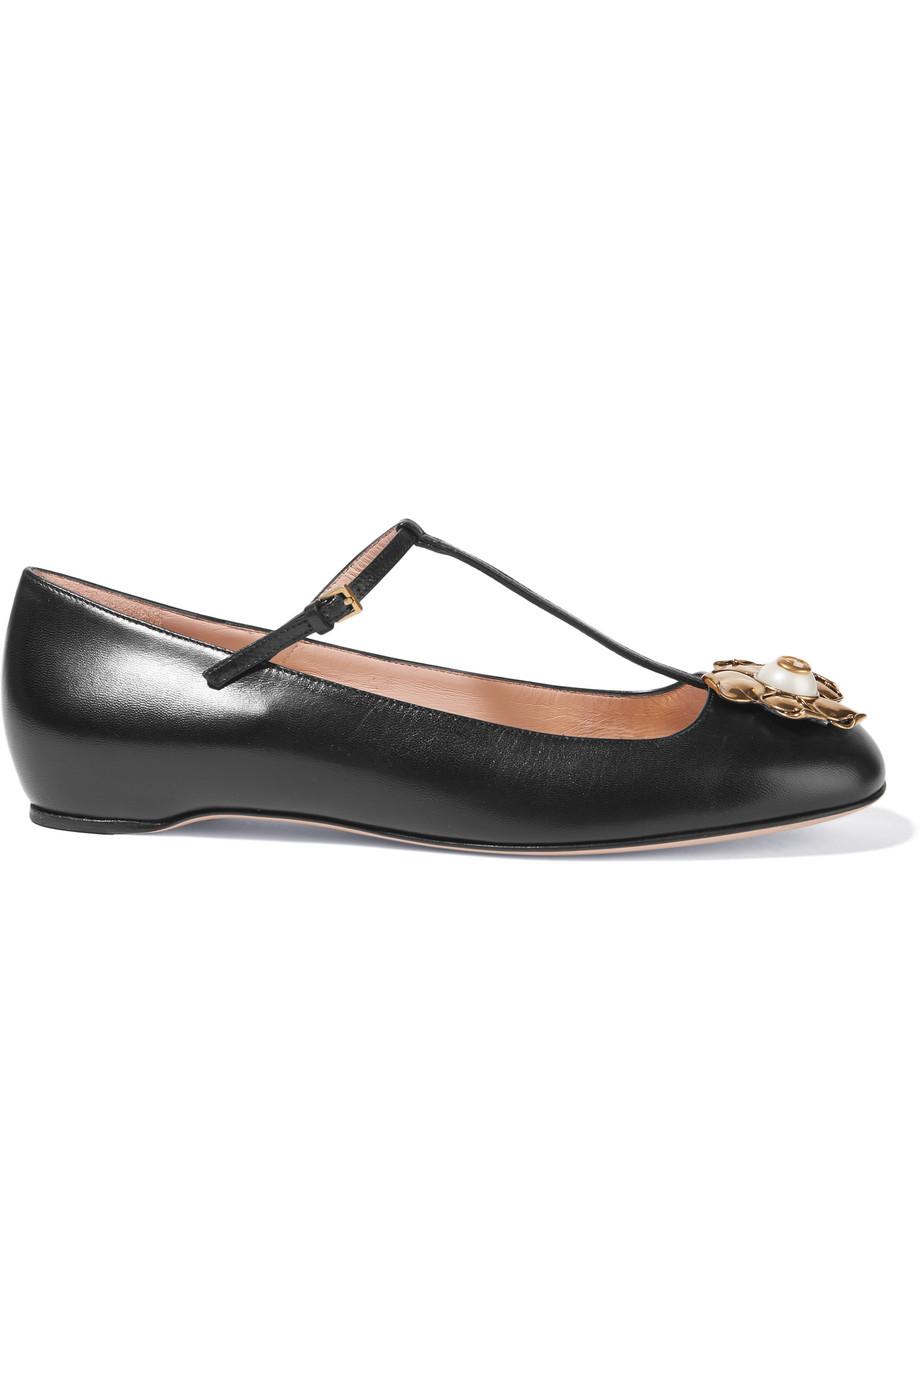 Gucci Embellished Leather Ballet Flats, Black, Women's US Size: 7.5, Size: 38